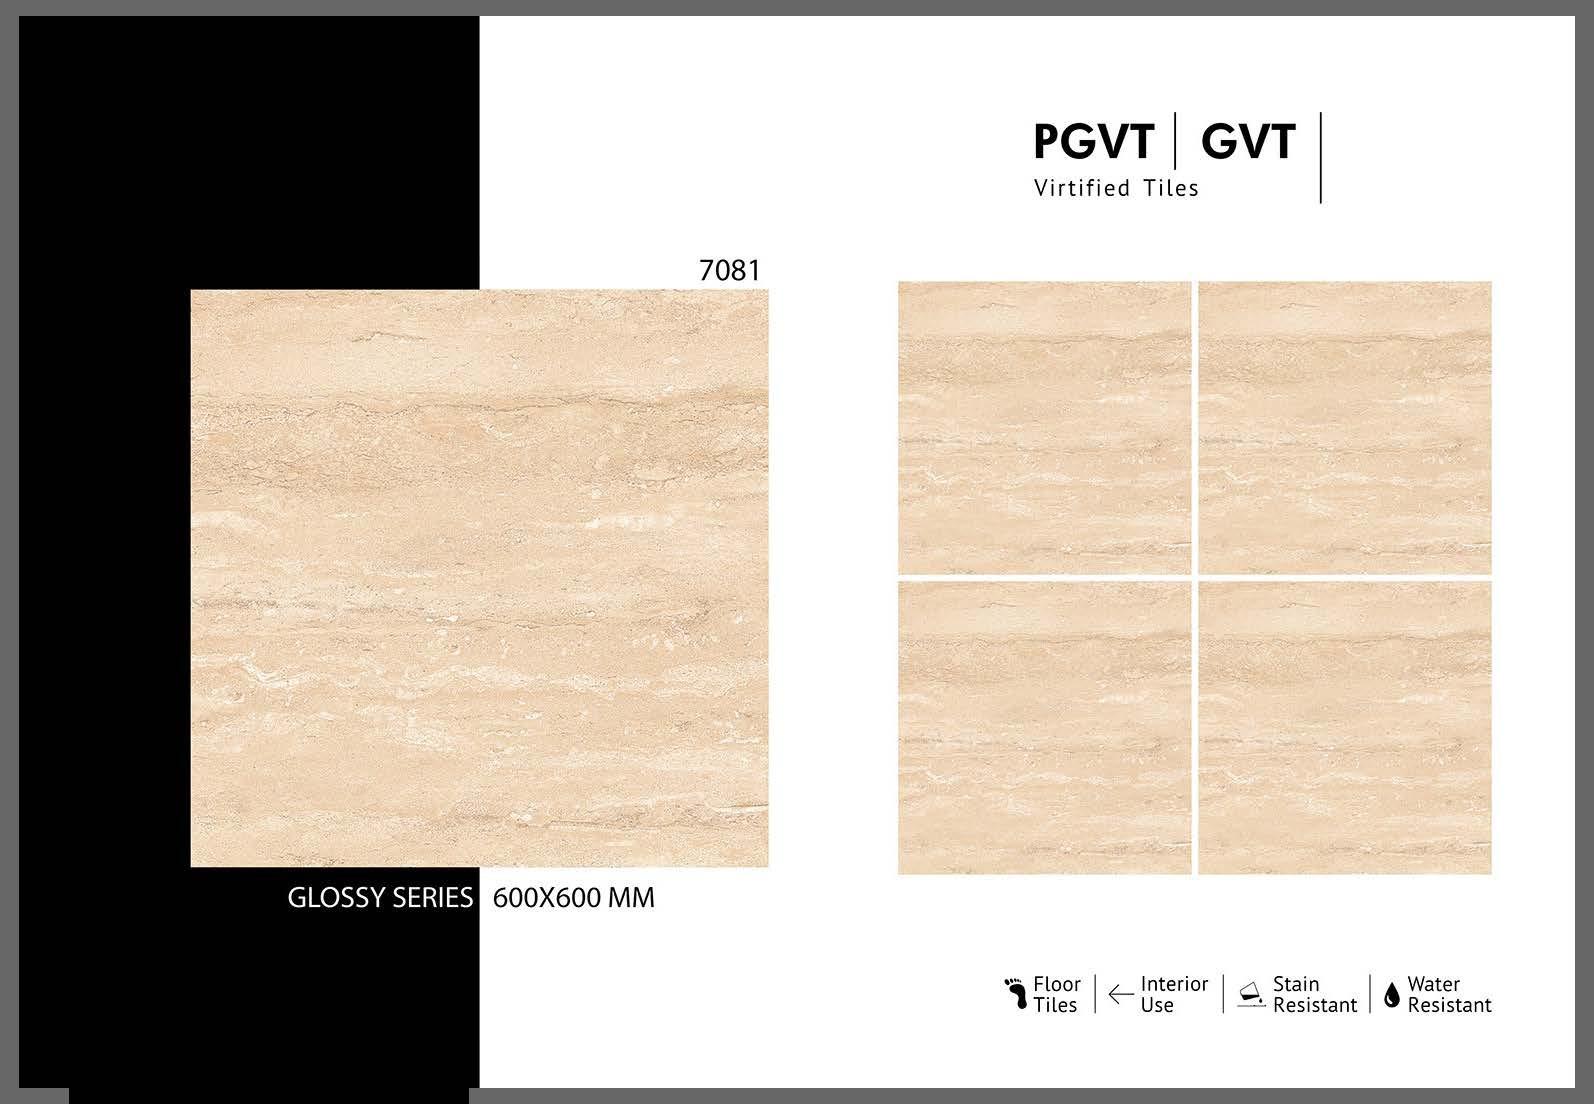 GVT 2X2 GLOSSY_Page_68.jpg